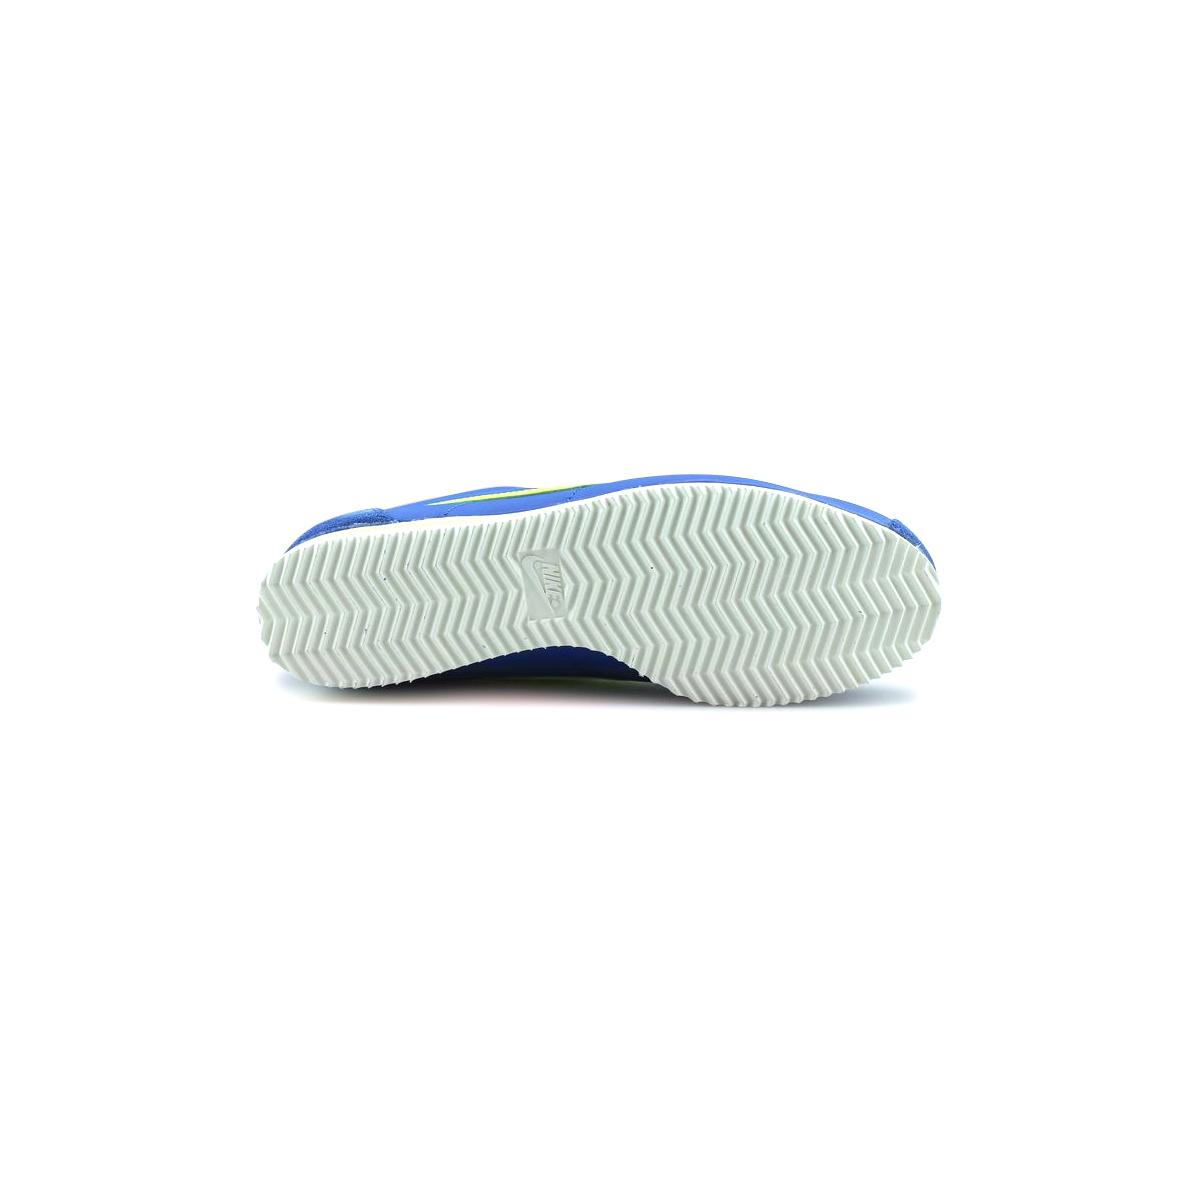 vans otw bedford - Nike Classic Cortez Nylon Aw Bleu 844855-470 - Achat et vente